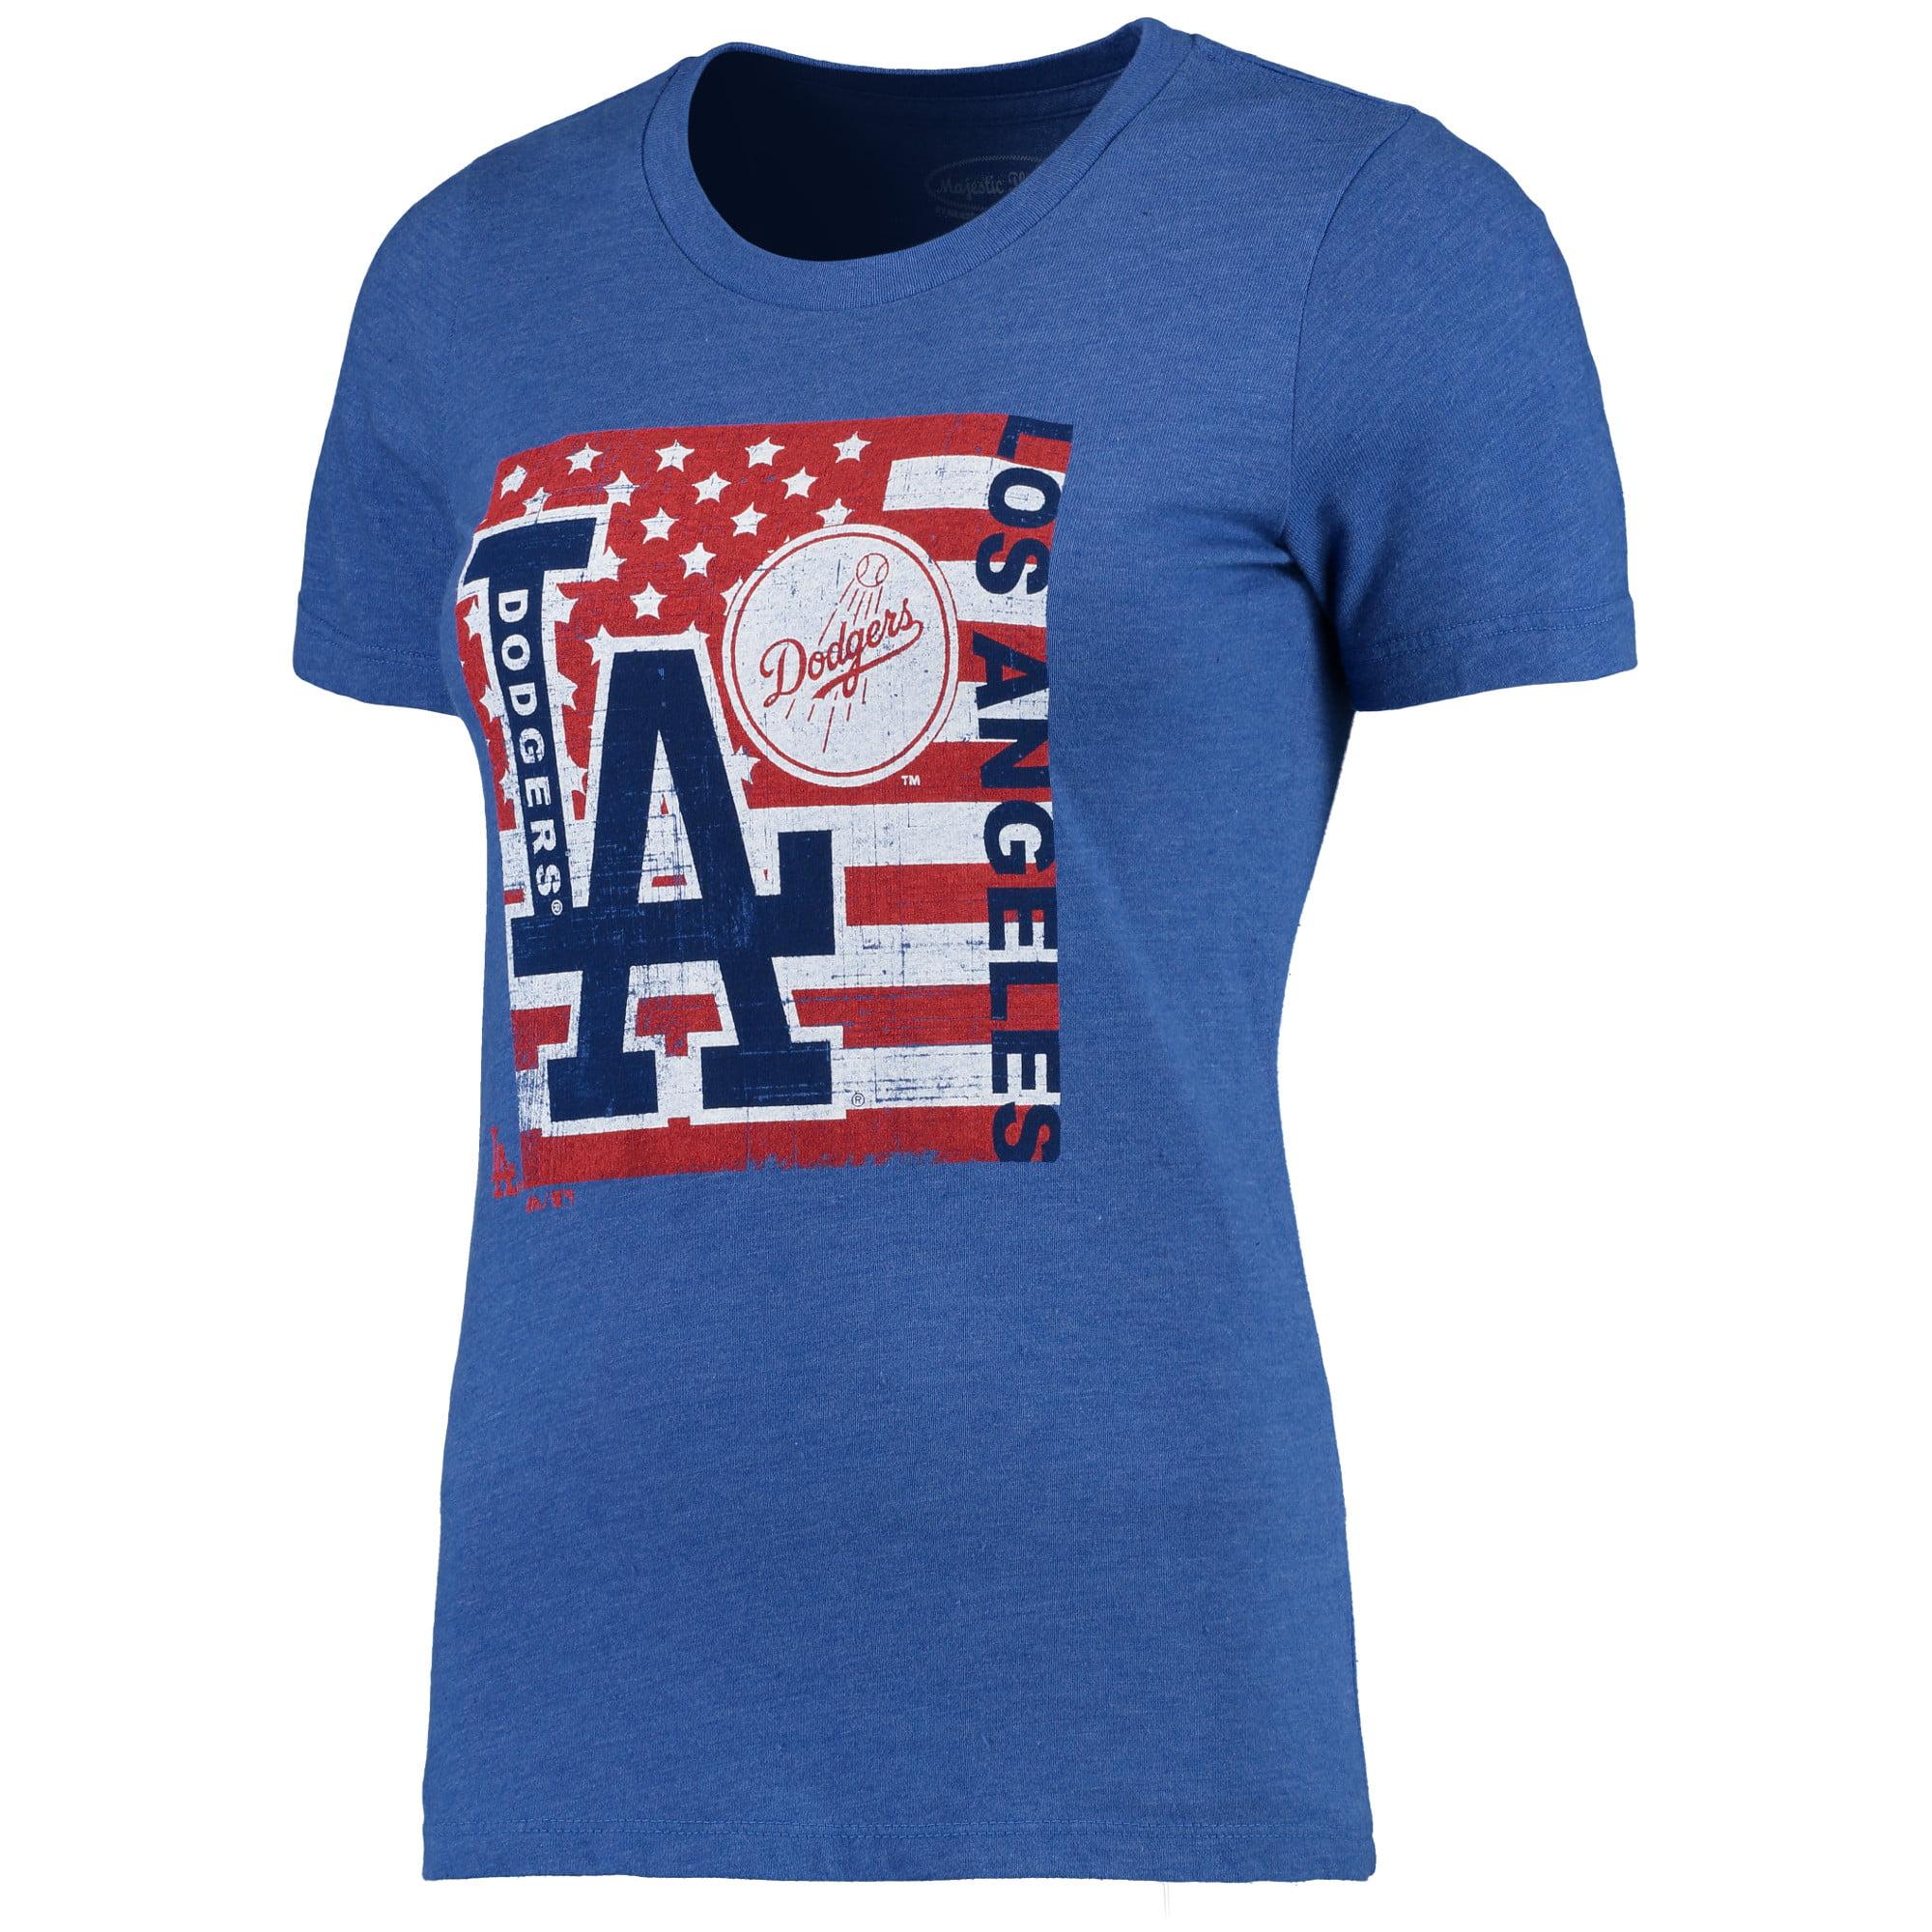 Los Angeles Dodgers Majestic Threads Women's Stars & Stripes Flag T-Shirt - Royal